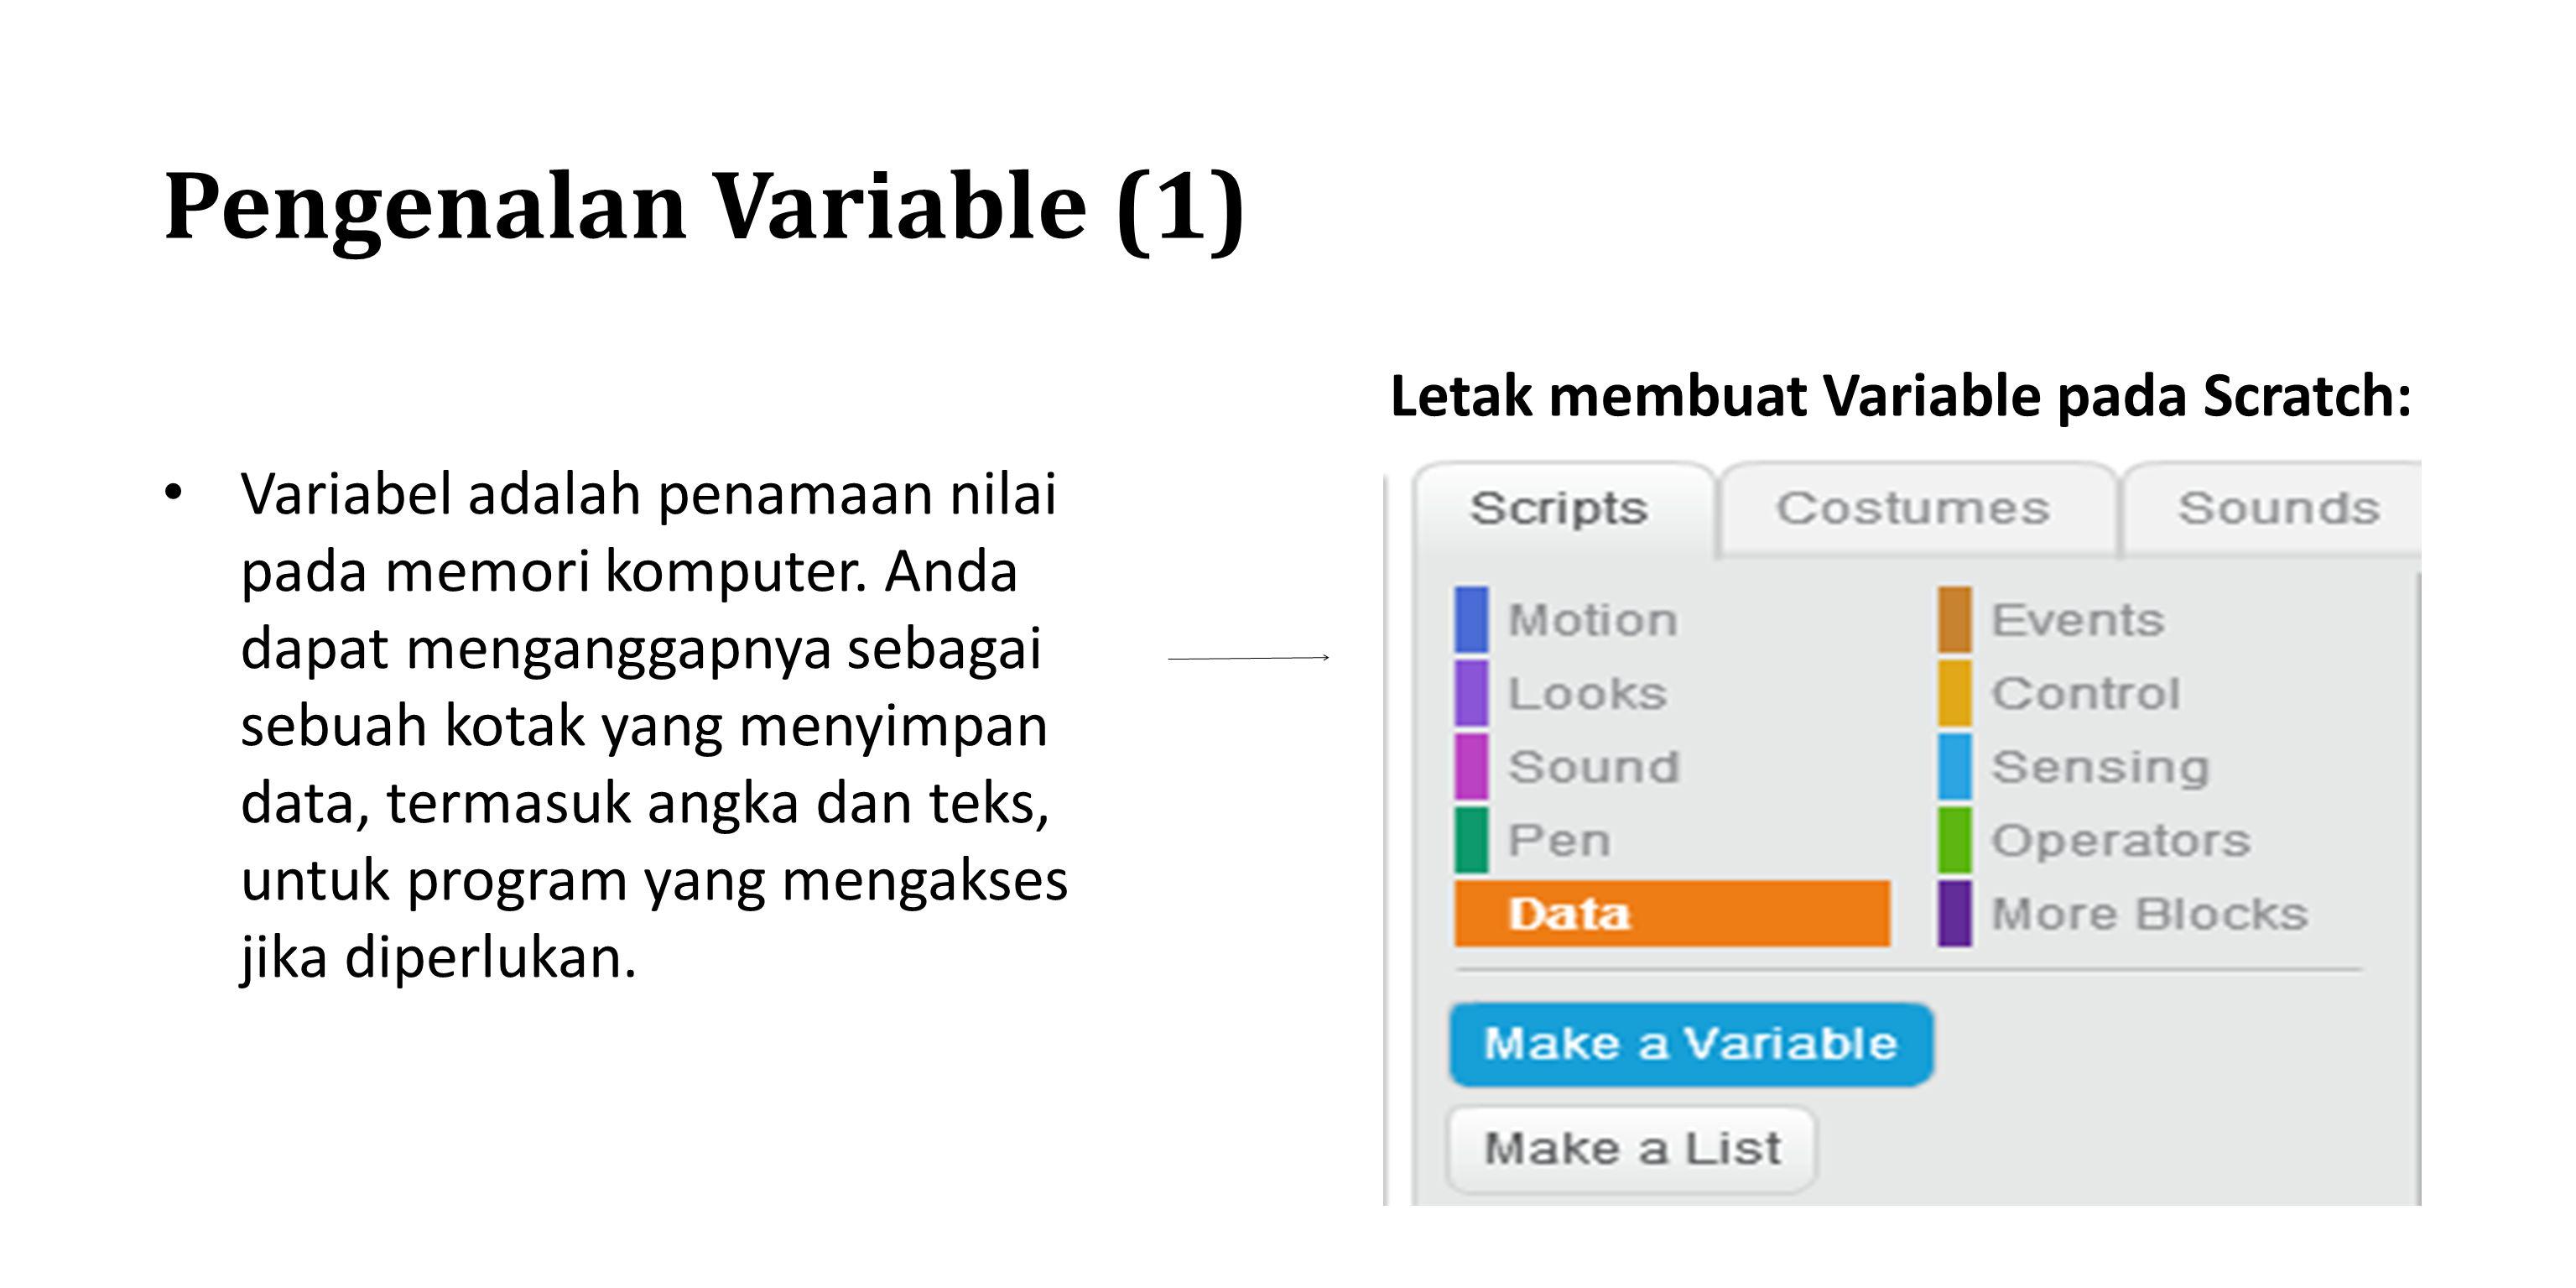 Pengenalan Variable (1) Letak membuat Variable pada Scratch: Variabel adalah penamaan nilai pada memori komputer. Anda dapat menganggapnya sebagai seb